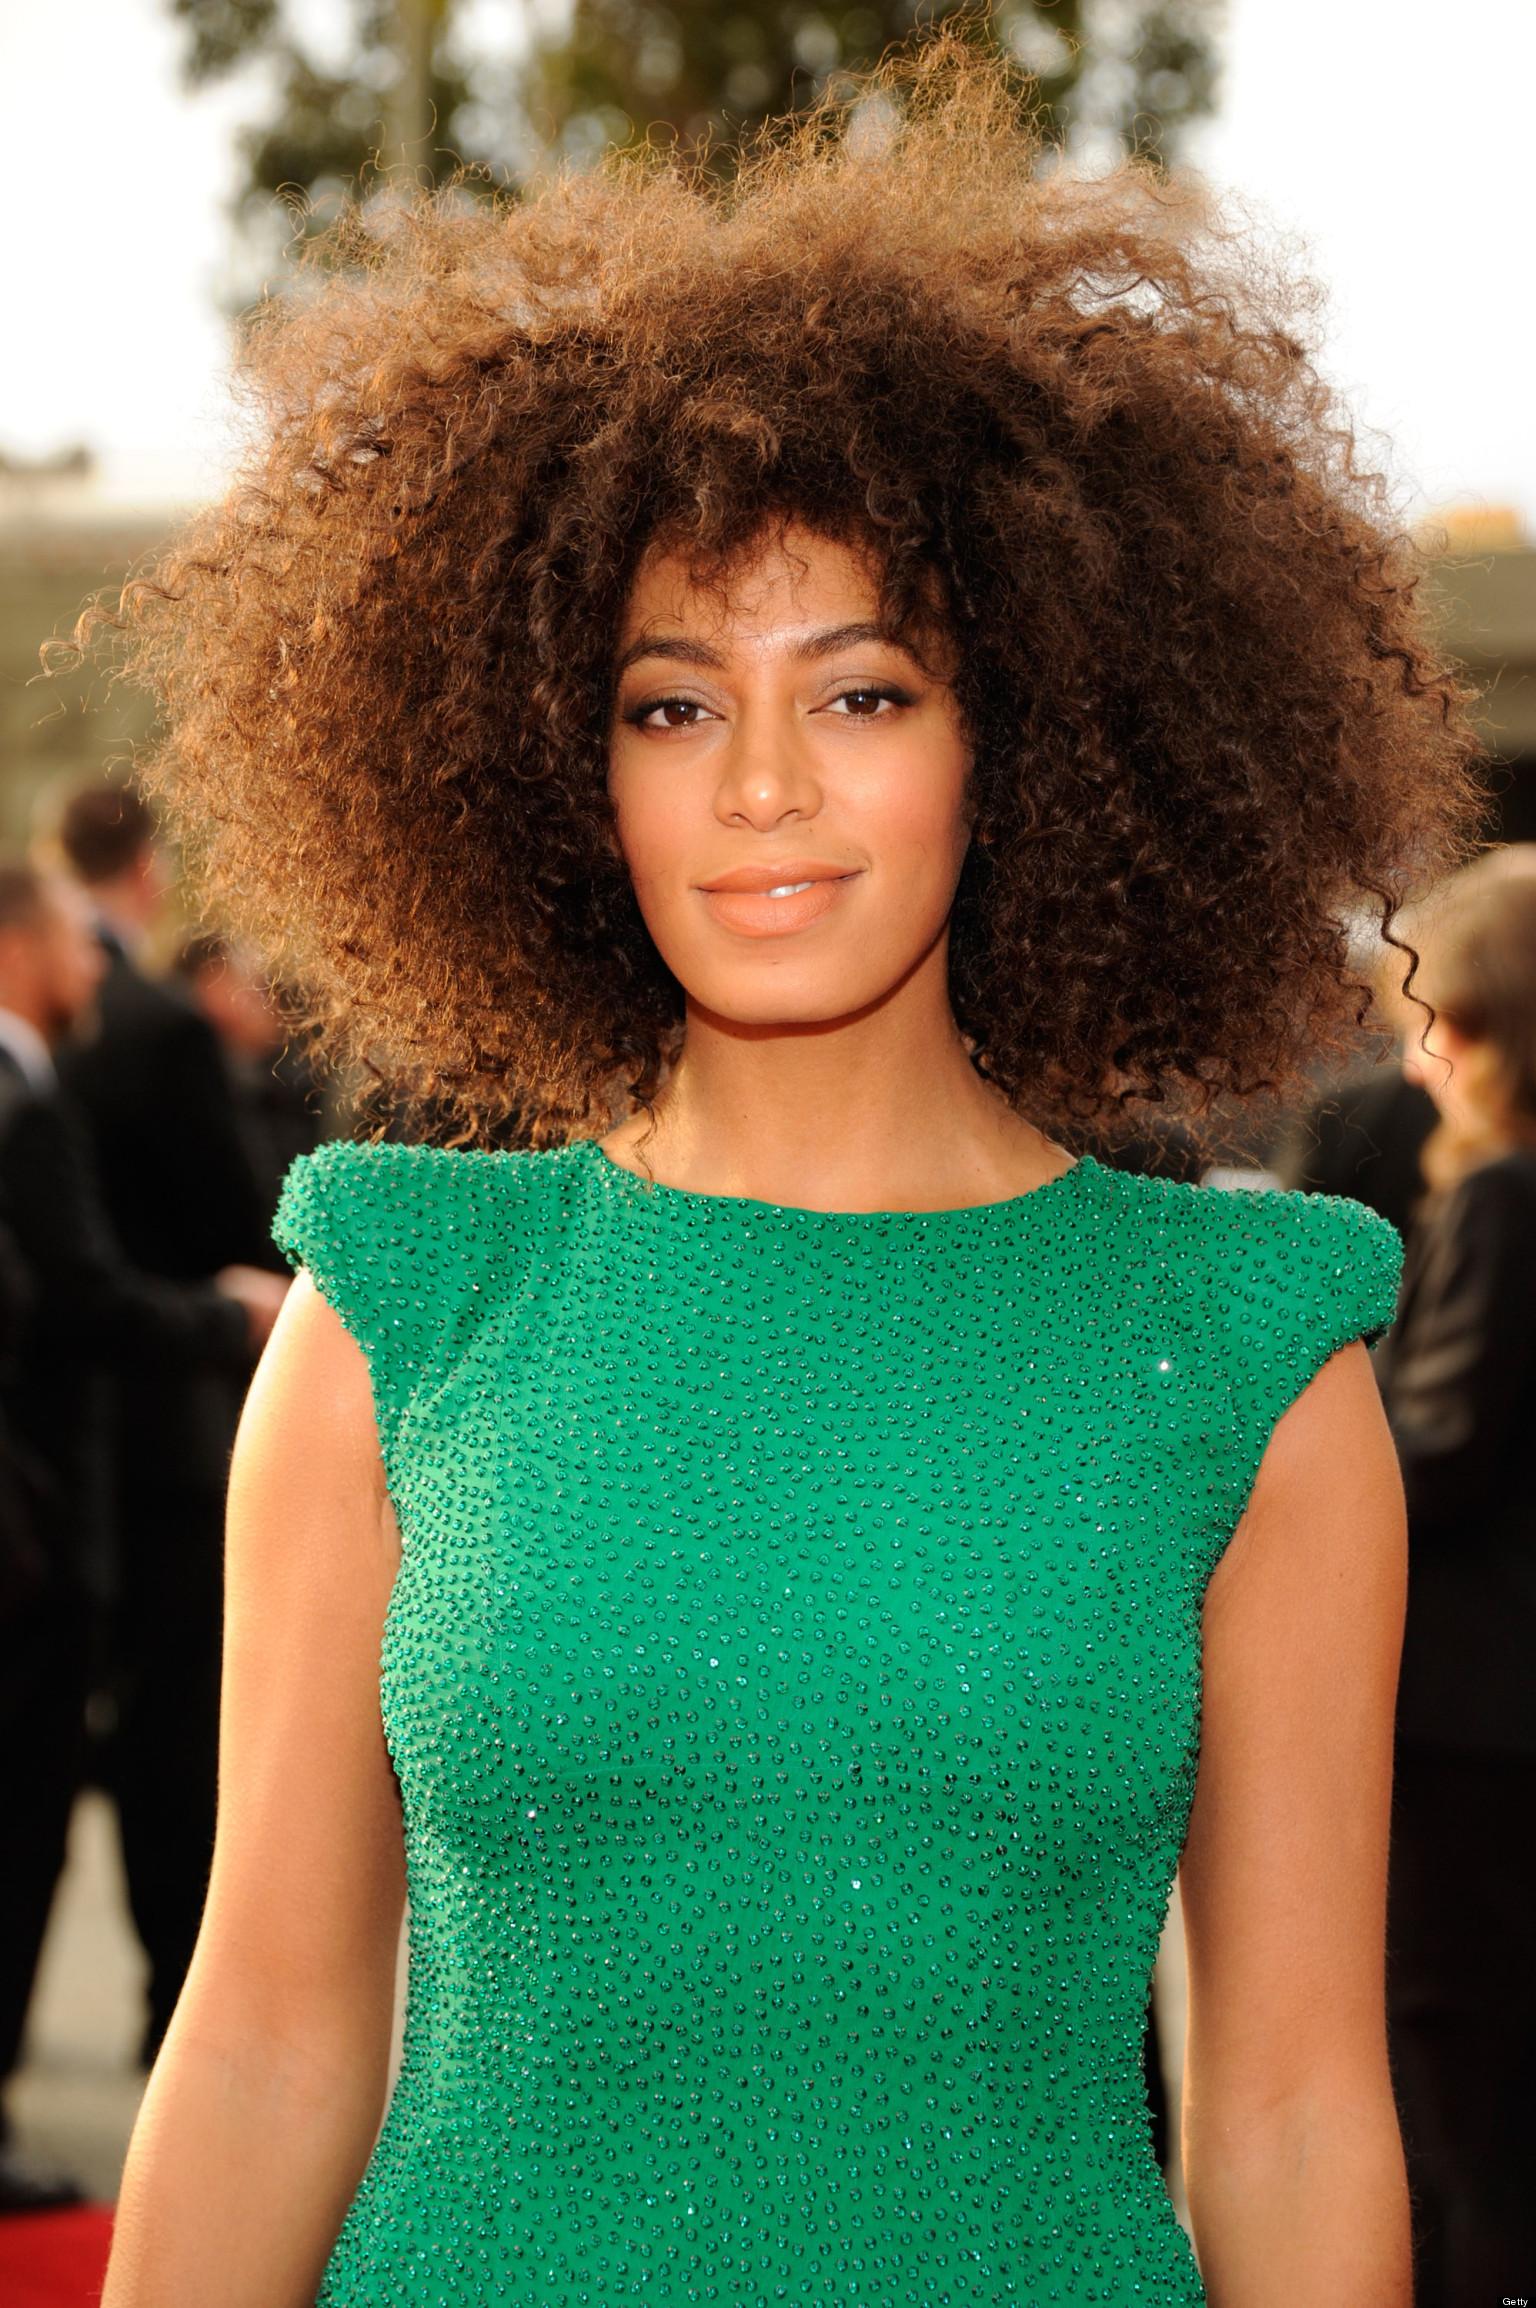 Solange Knowles Grammys Dress 2013 Singer Wears High Slit